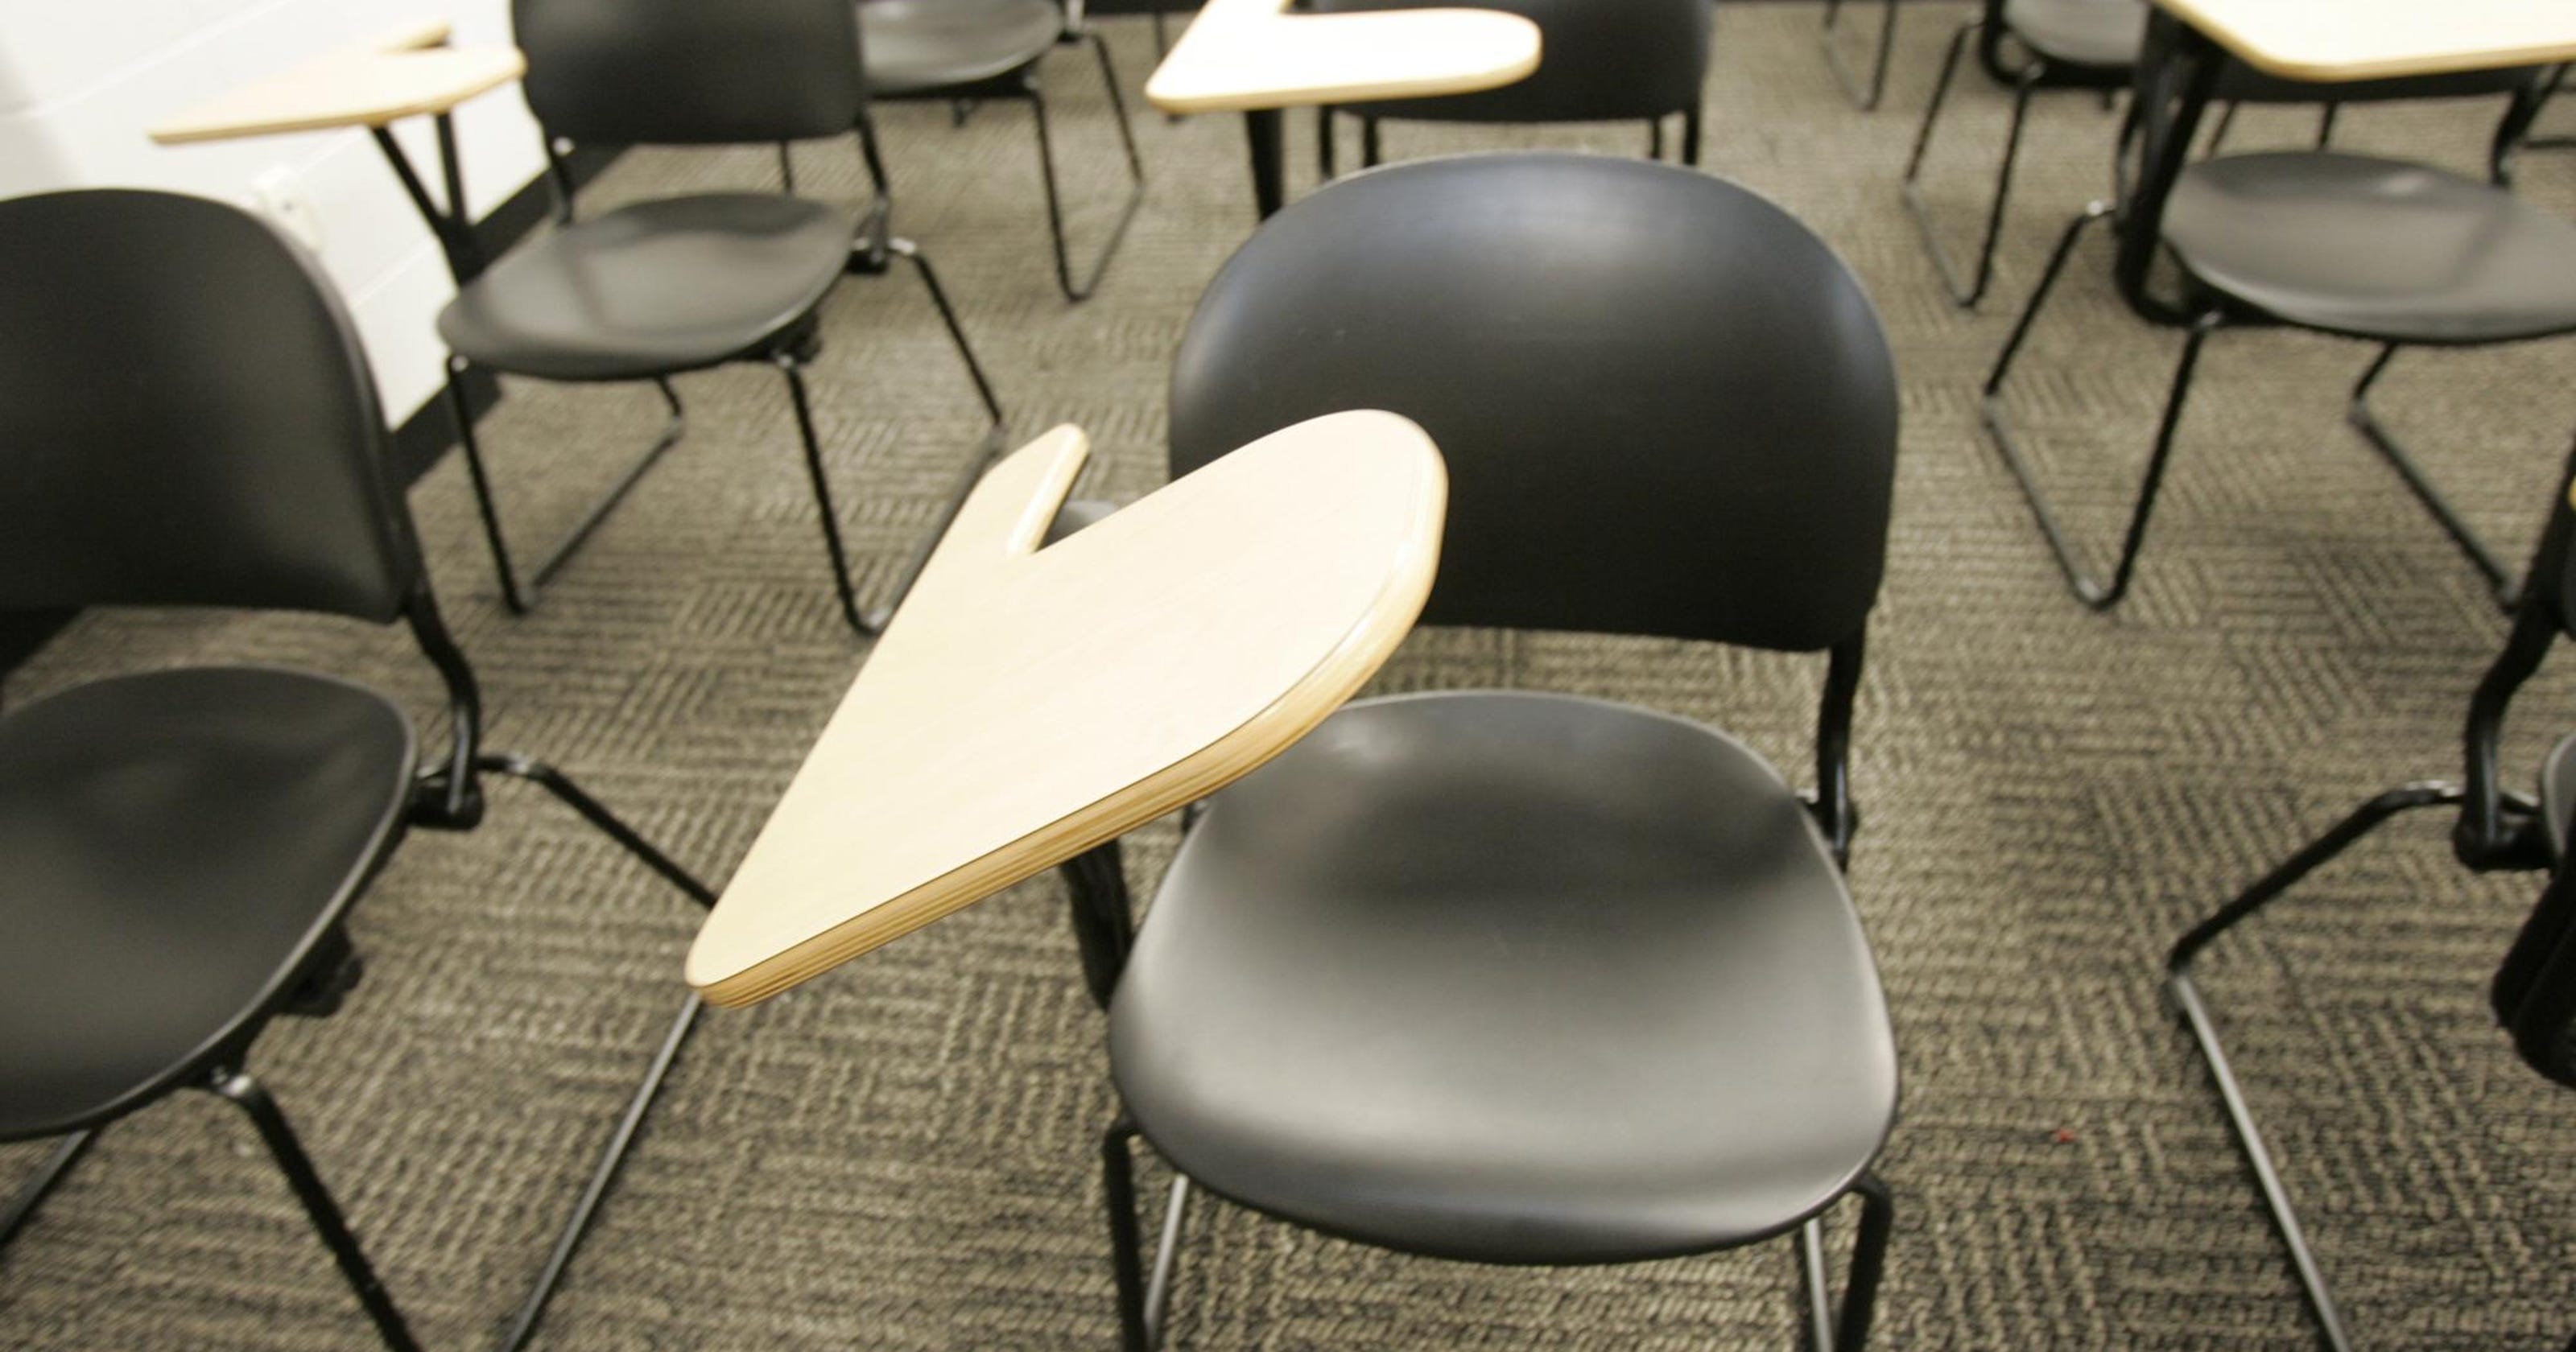 Unions Blast Alternate Teacher Certification Program